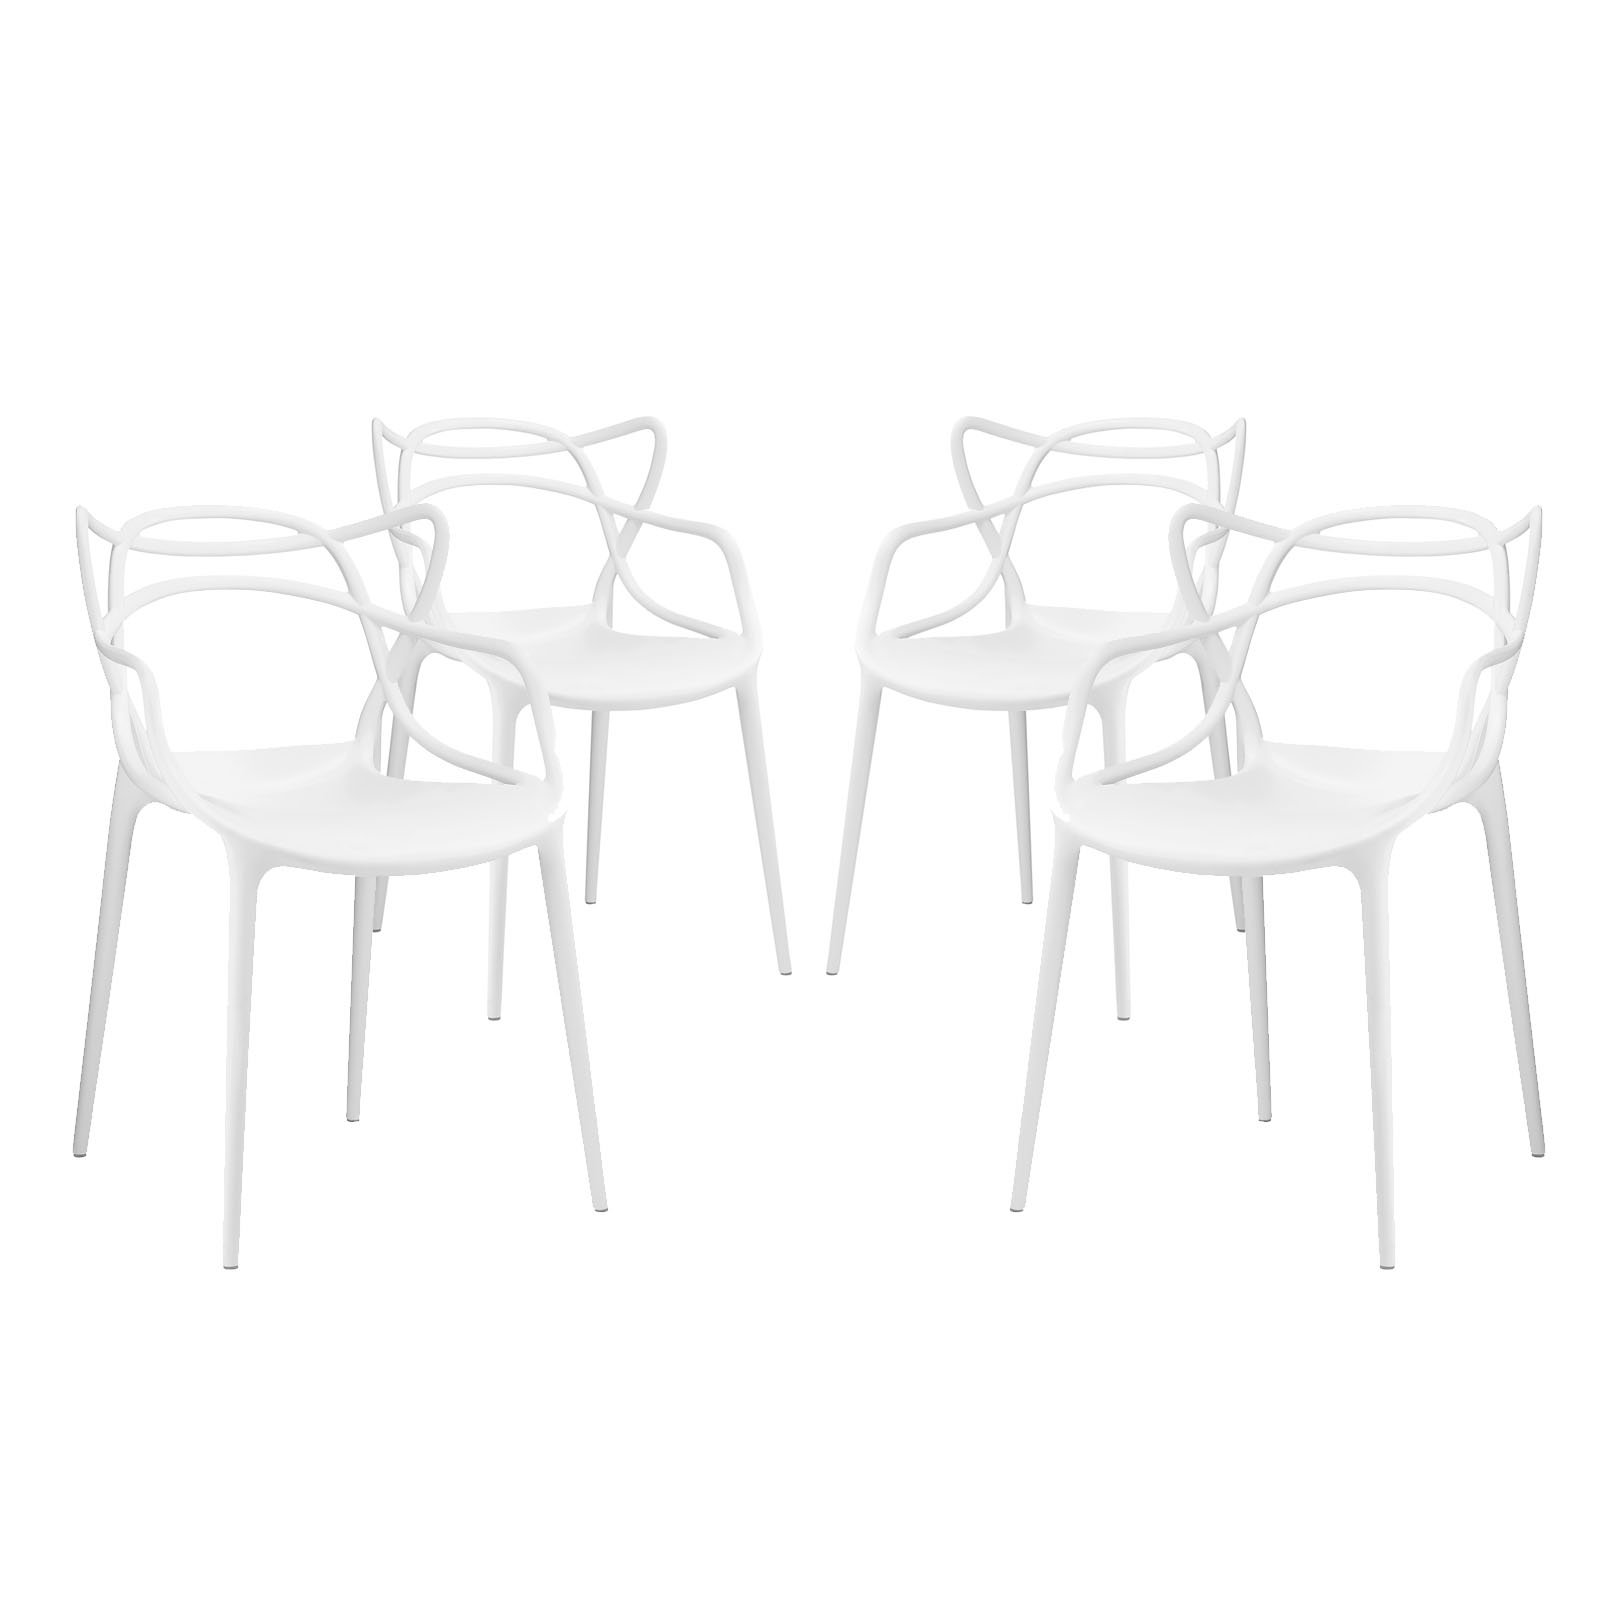 Modway Entangled Dining Set (Set of 4), White by Modway (Image #1)